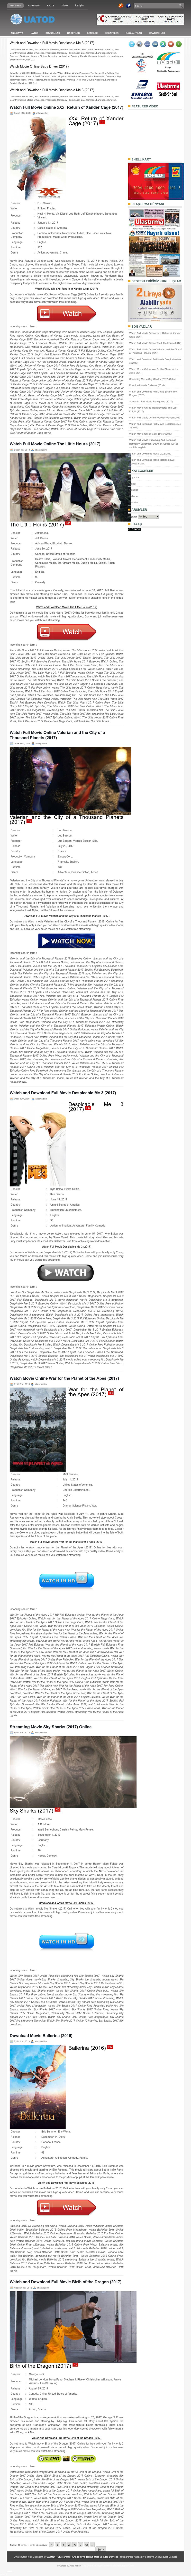 Uatod Competitors, Revenue and Employees - Owler Company Profile